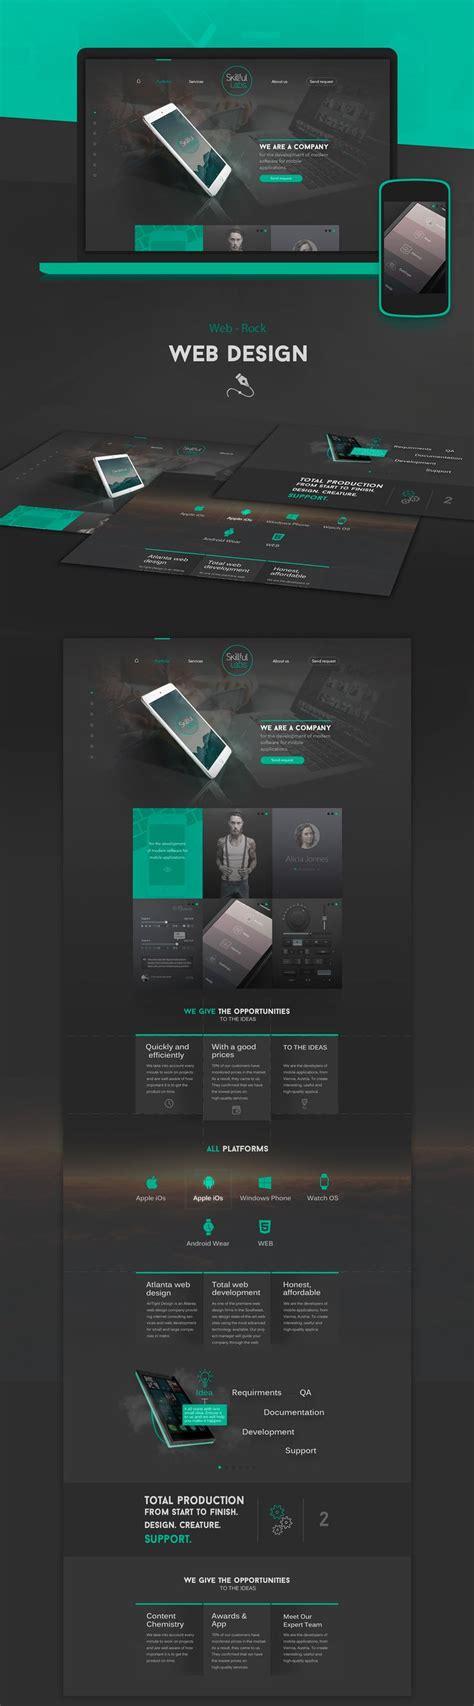 25 web design firm ideas on web 25 best ideas about web design on website Best